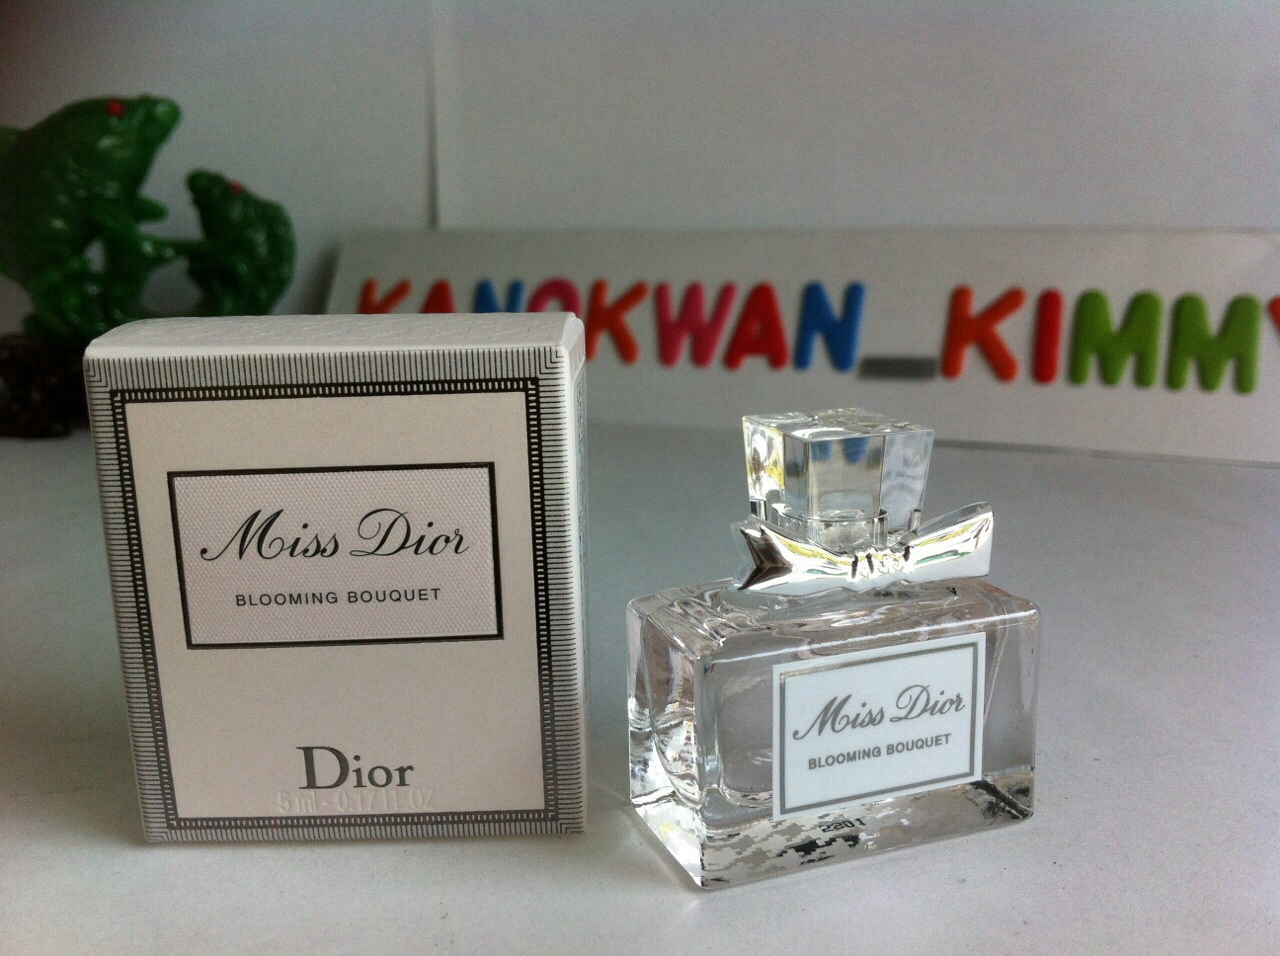 #Dior Miss Dior Blooming Bouquet แบบแต้ม ไซส์มินิ สำหรับพกพา 5 ml